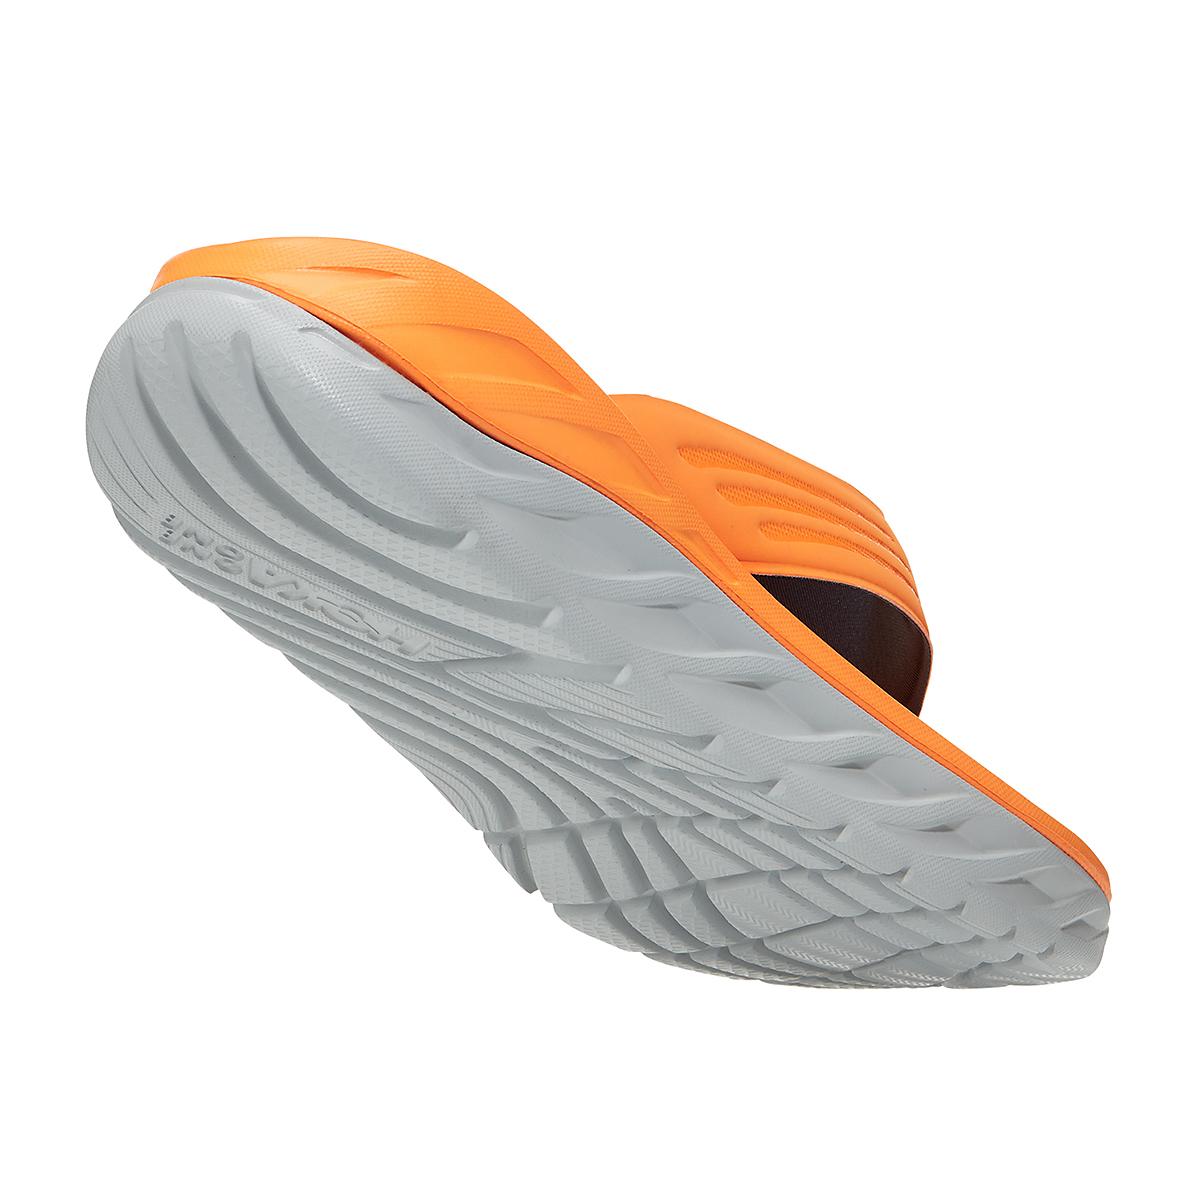 Men's Hoka One One Ora Recovery Flip 2 - Color: Blazing Orange/Lunar Rock - Size: 7 - Width: Regular, Blazing Orange/Lunar Rock, large, image 3